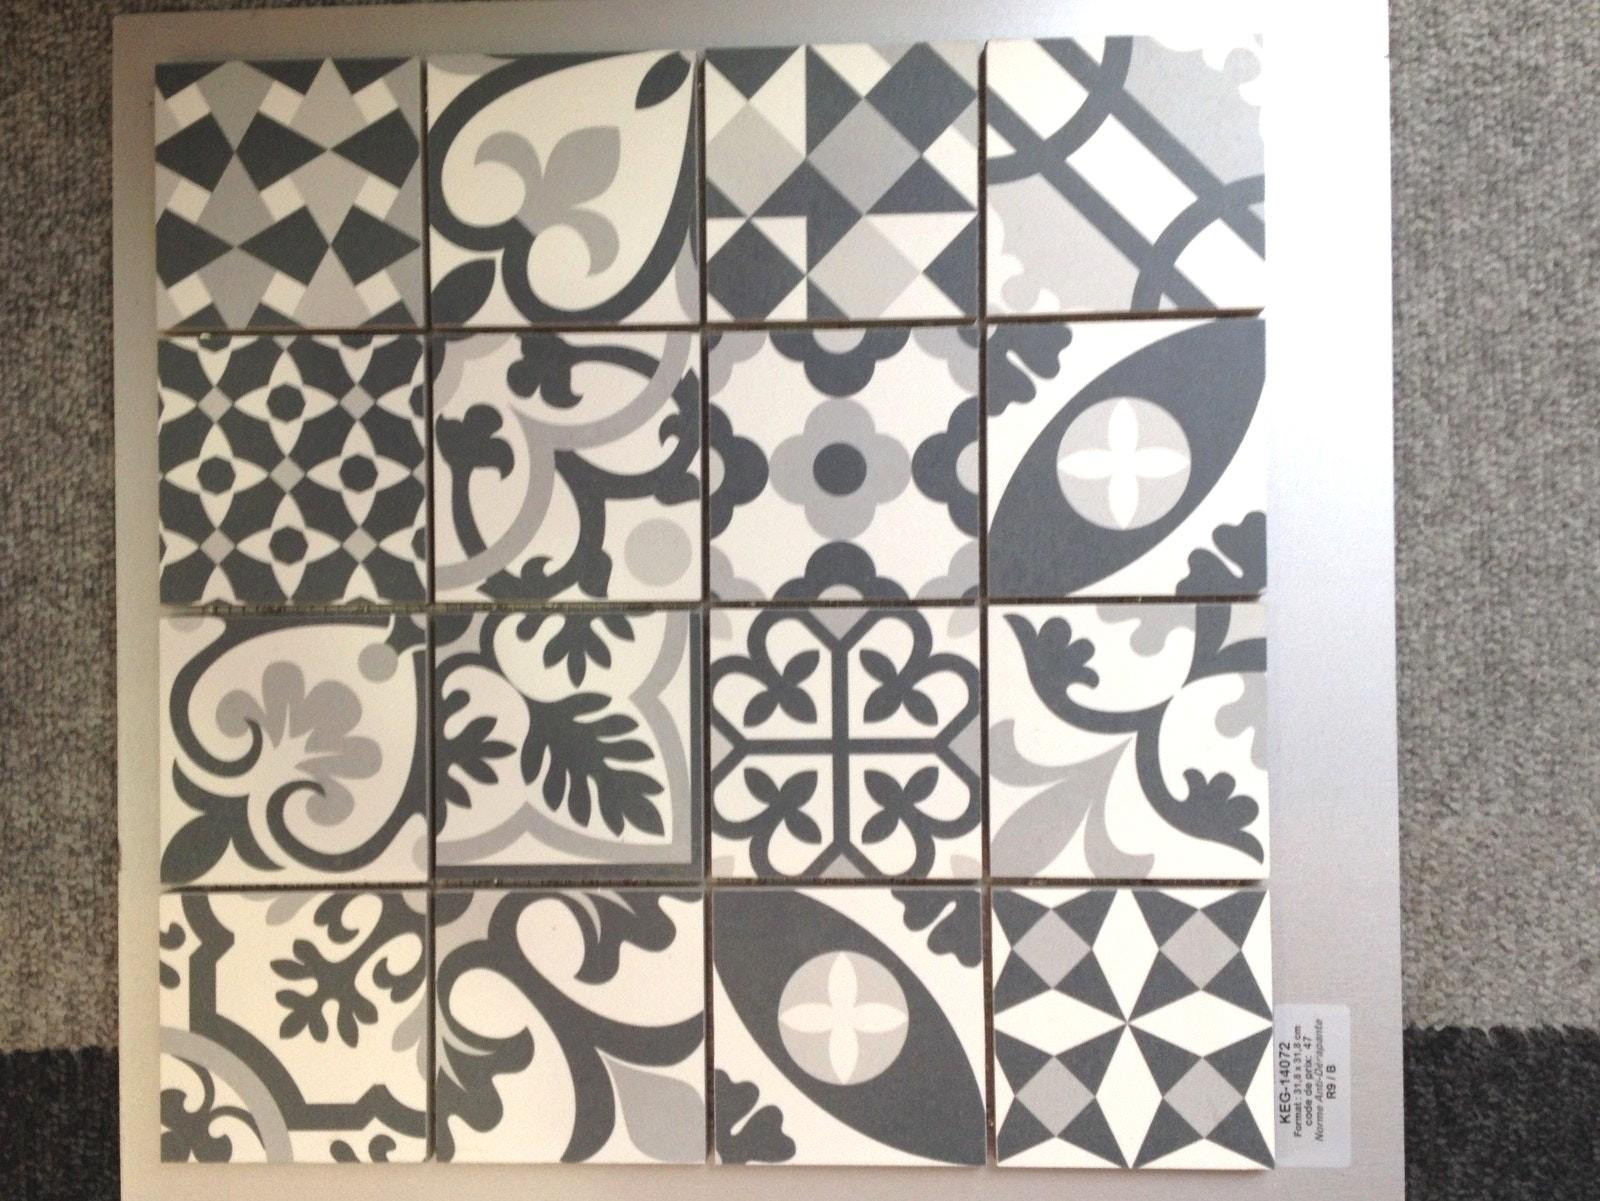 Carrelage Adhésif Salle De Bain Brico Depot Élégant Photos Carrelage Mural Gris Carrelage Mural Metro Castorama Cuisine 2018